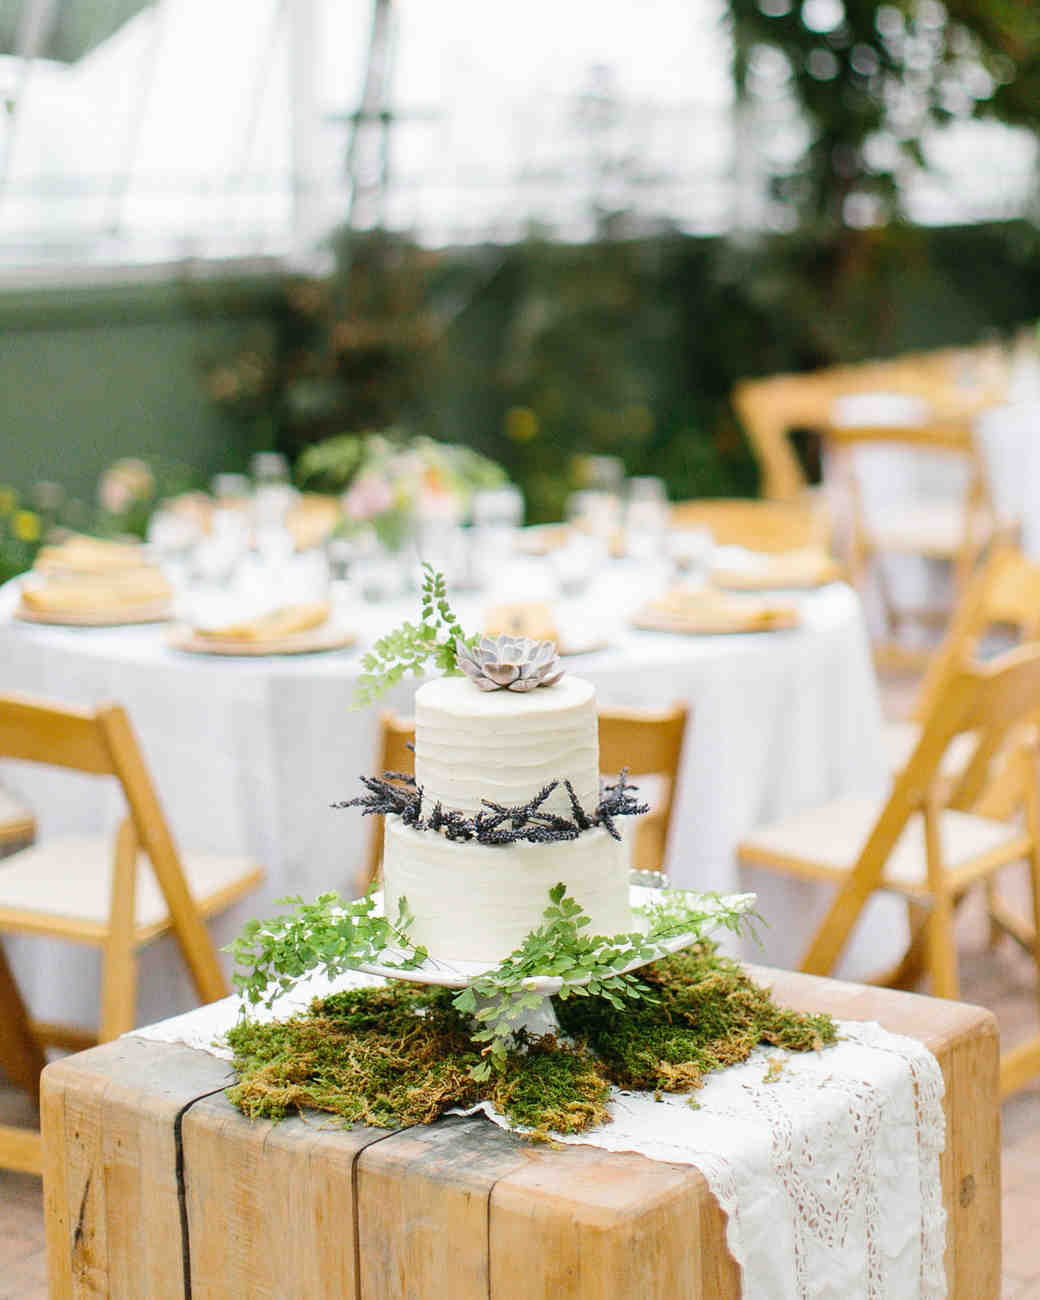 sandy-dwight-wedding-cake-0514.jpg